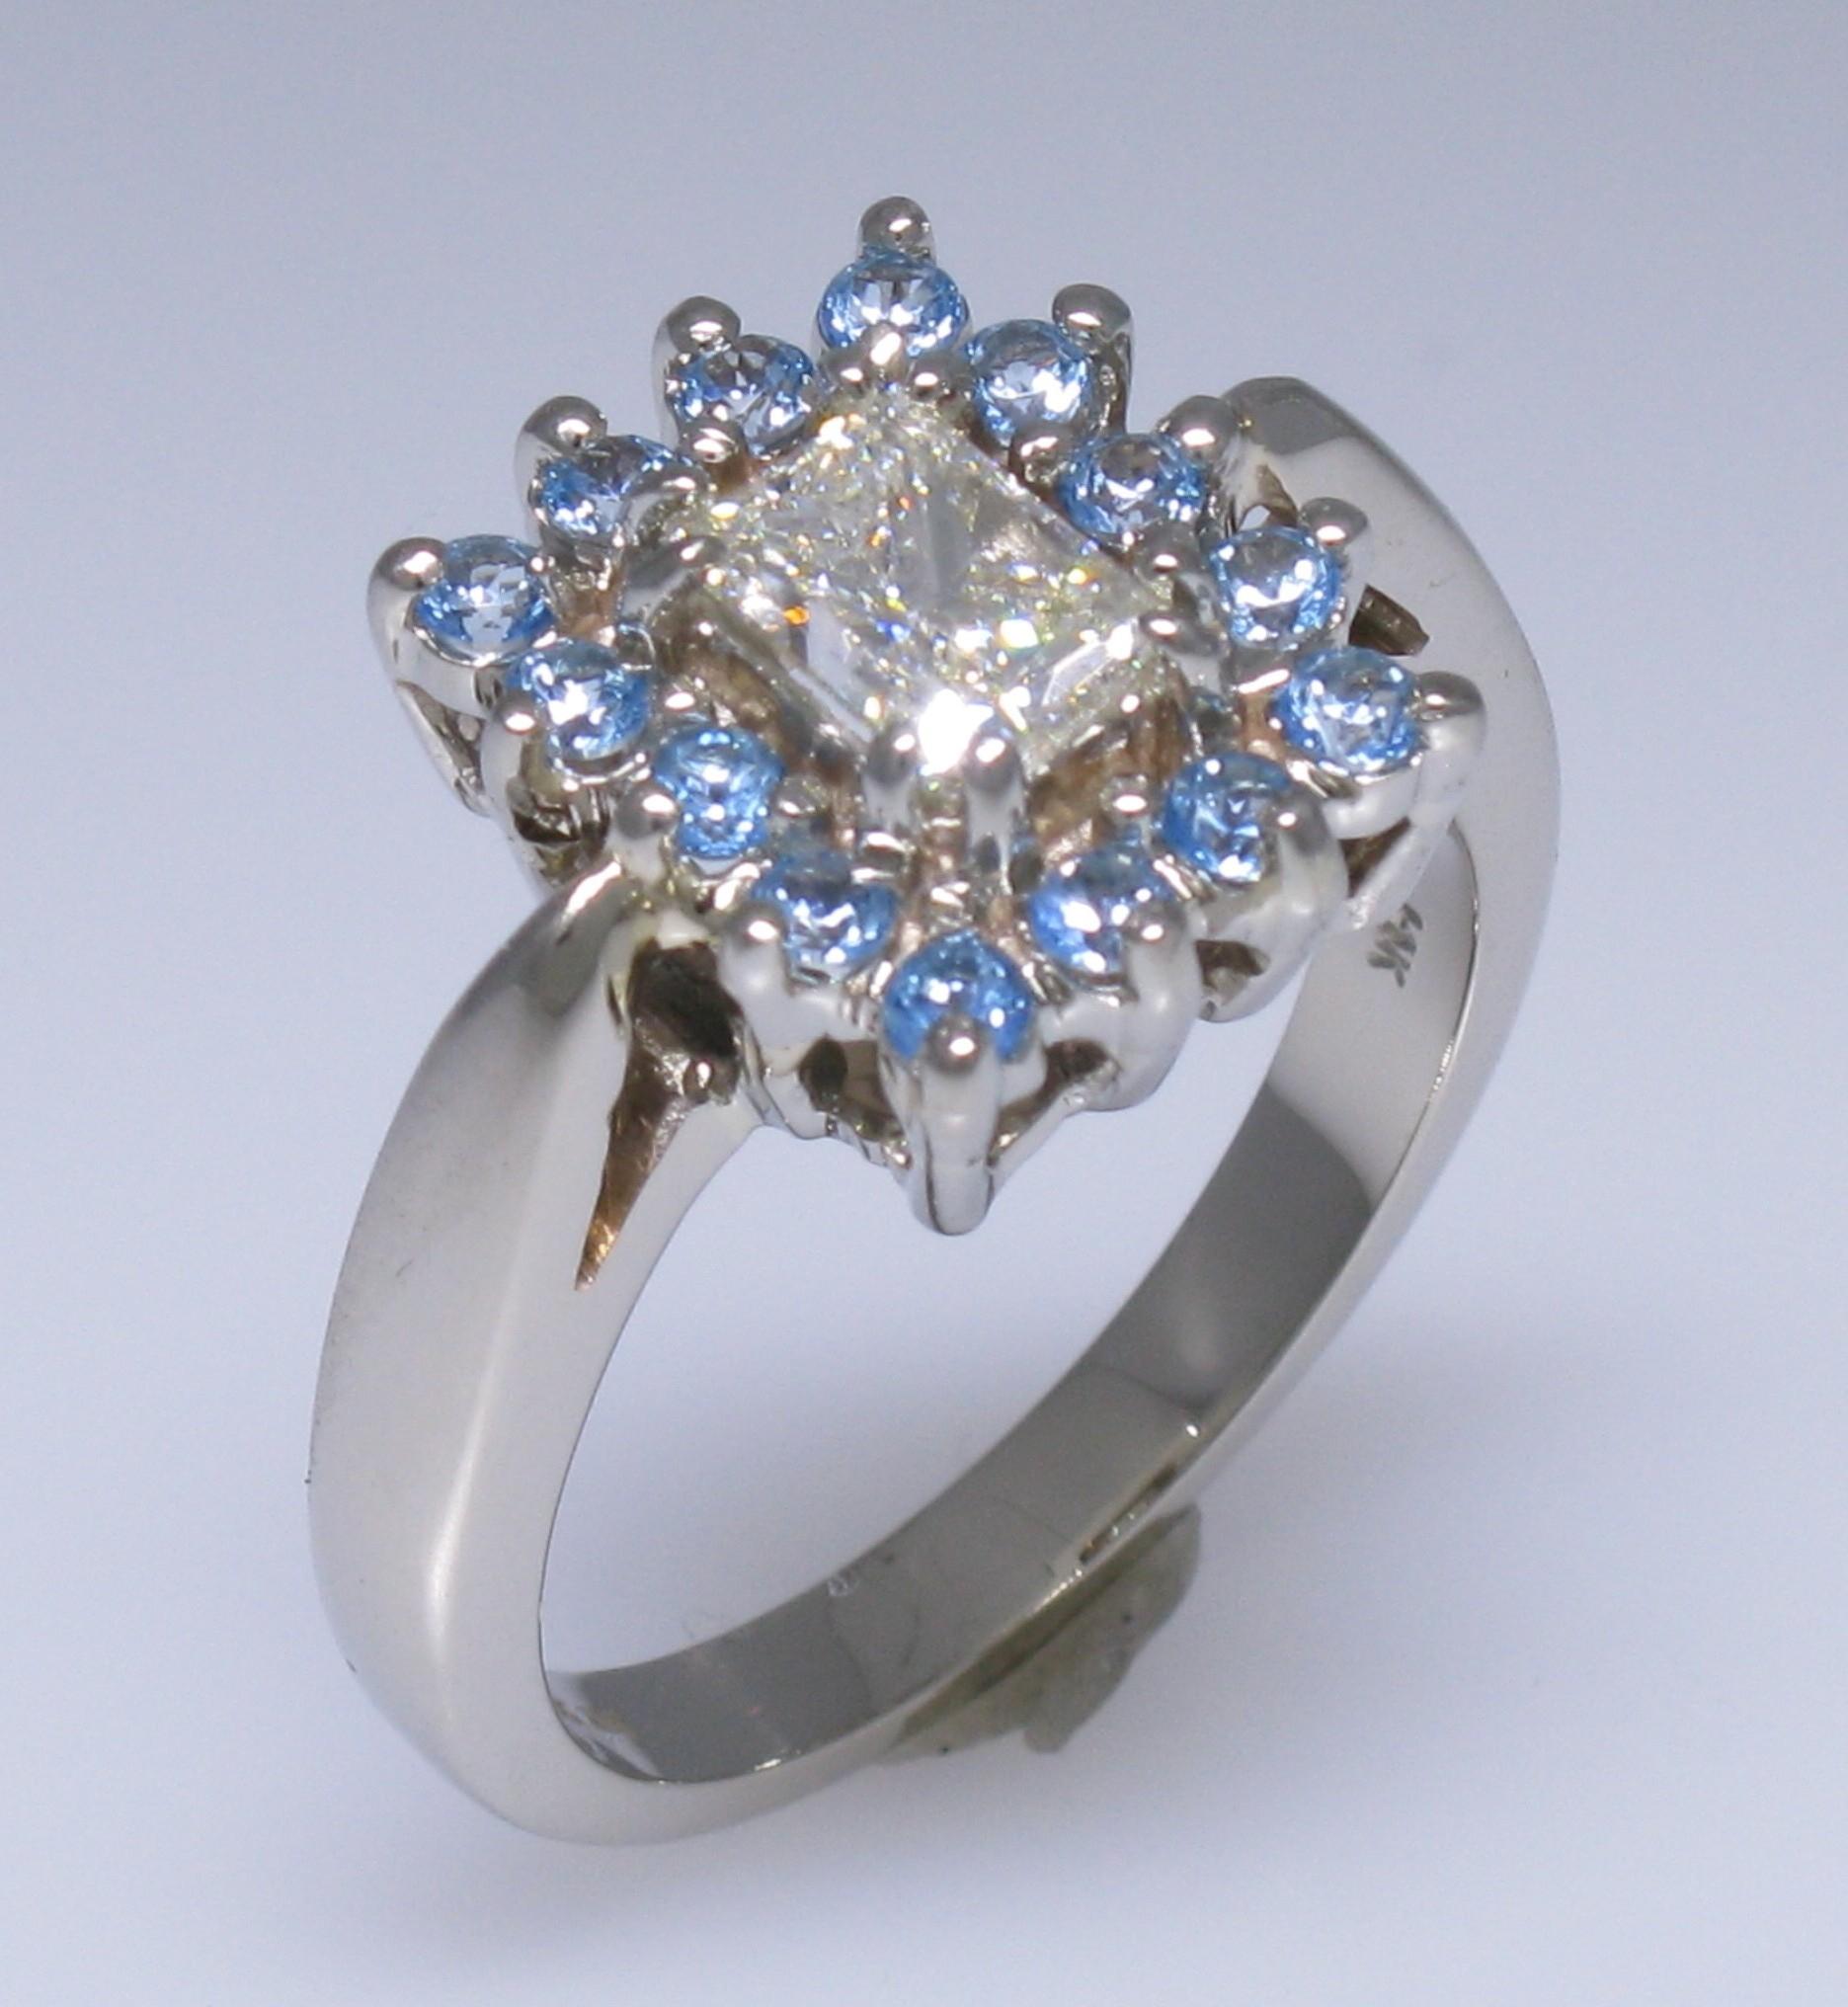 Rick's Fine Jewelry / Rick Pant / Cabin Jewelry, Milford OH